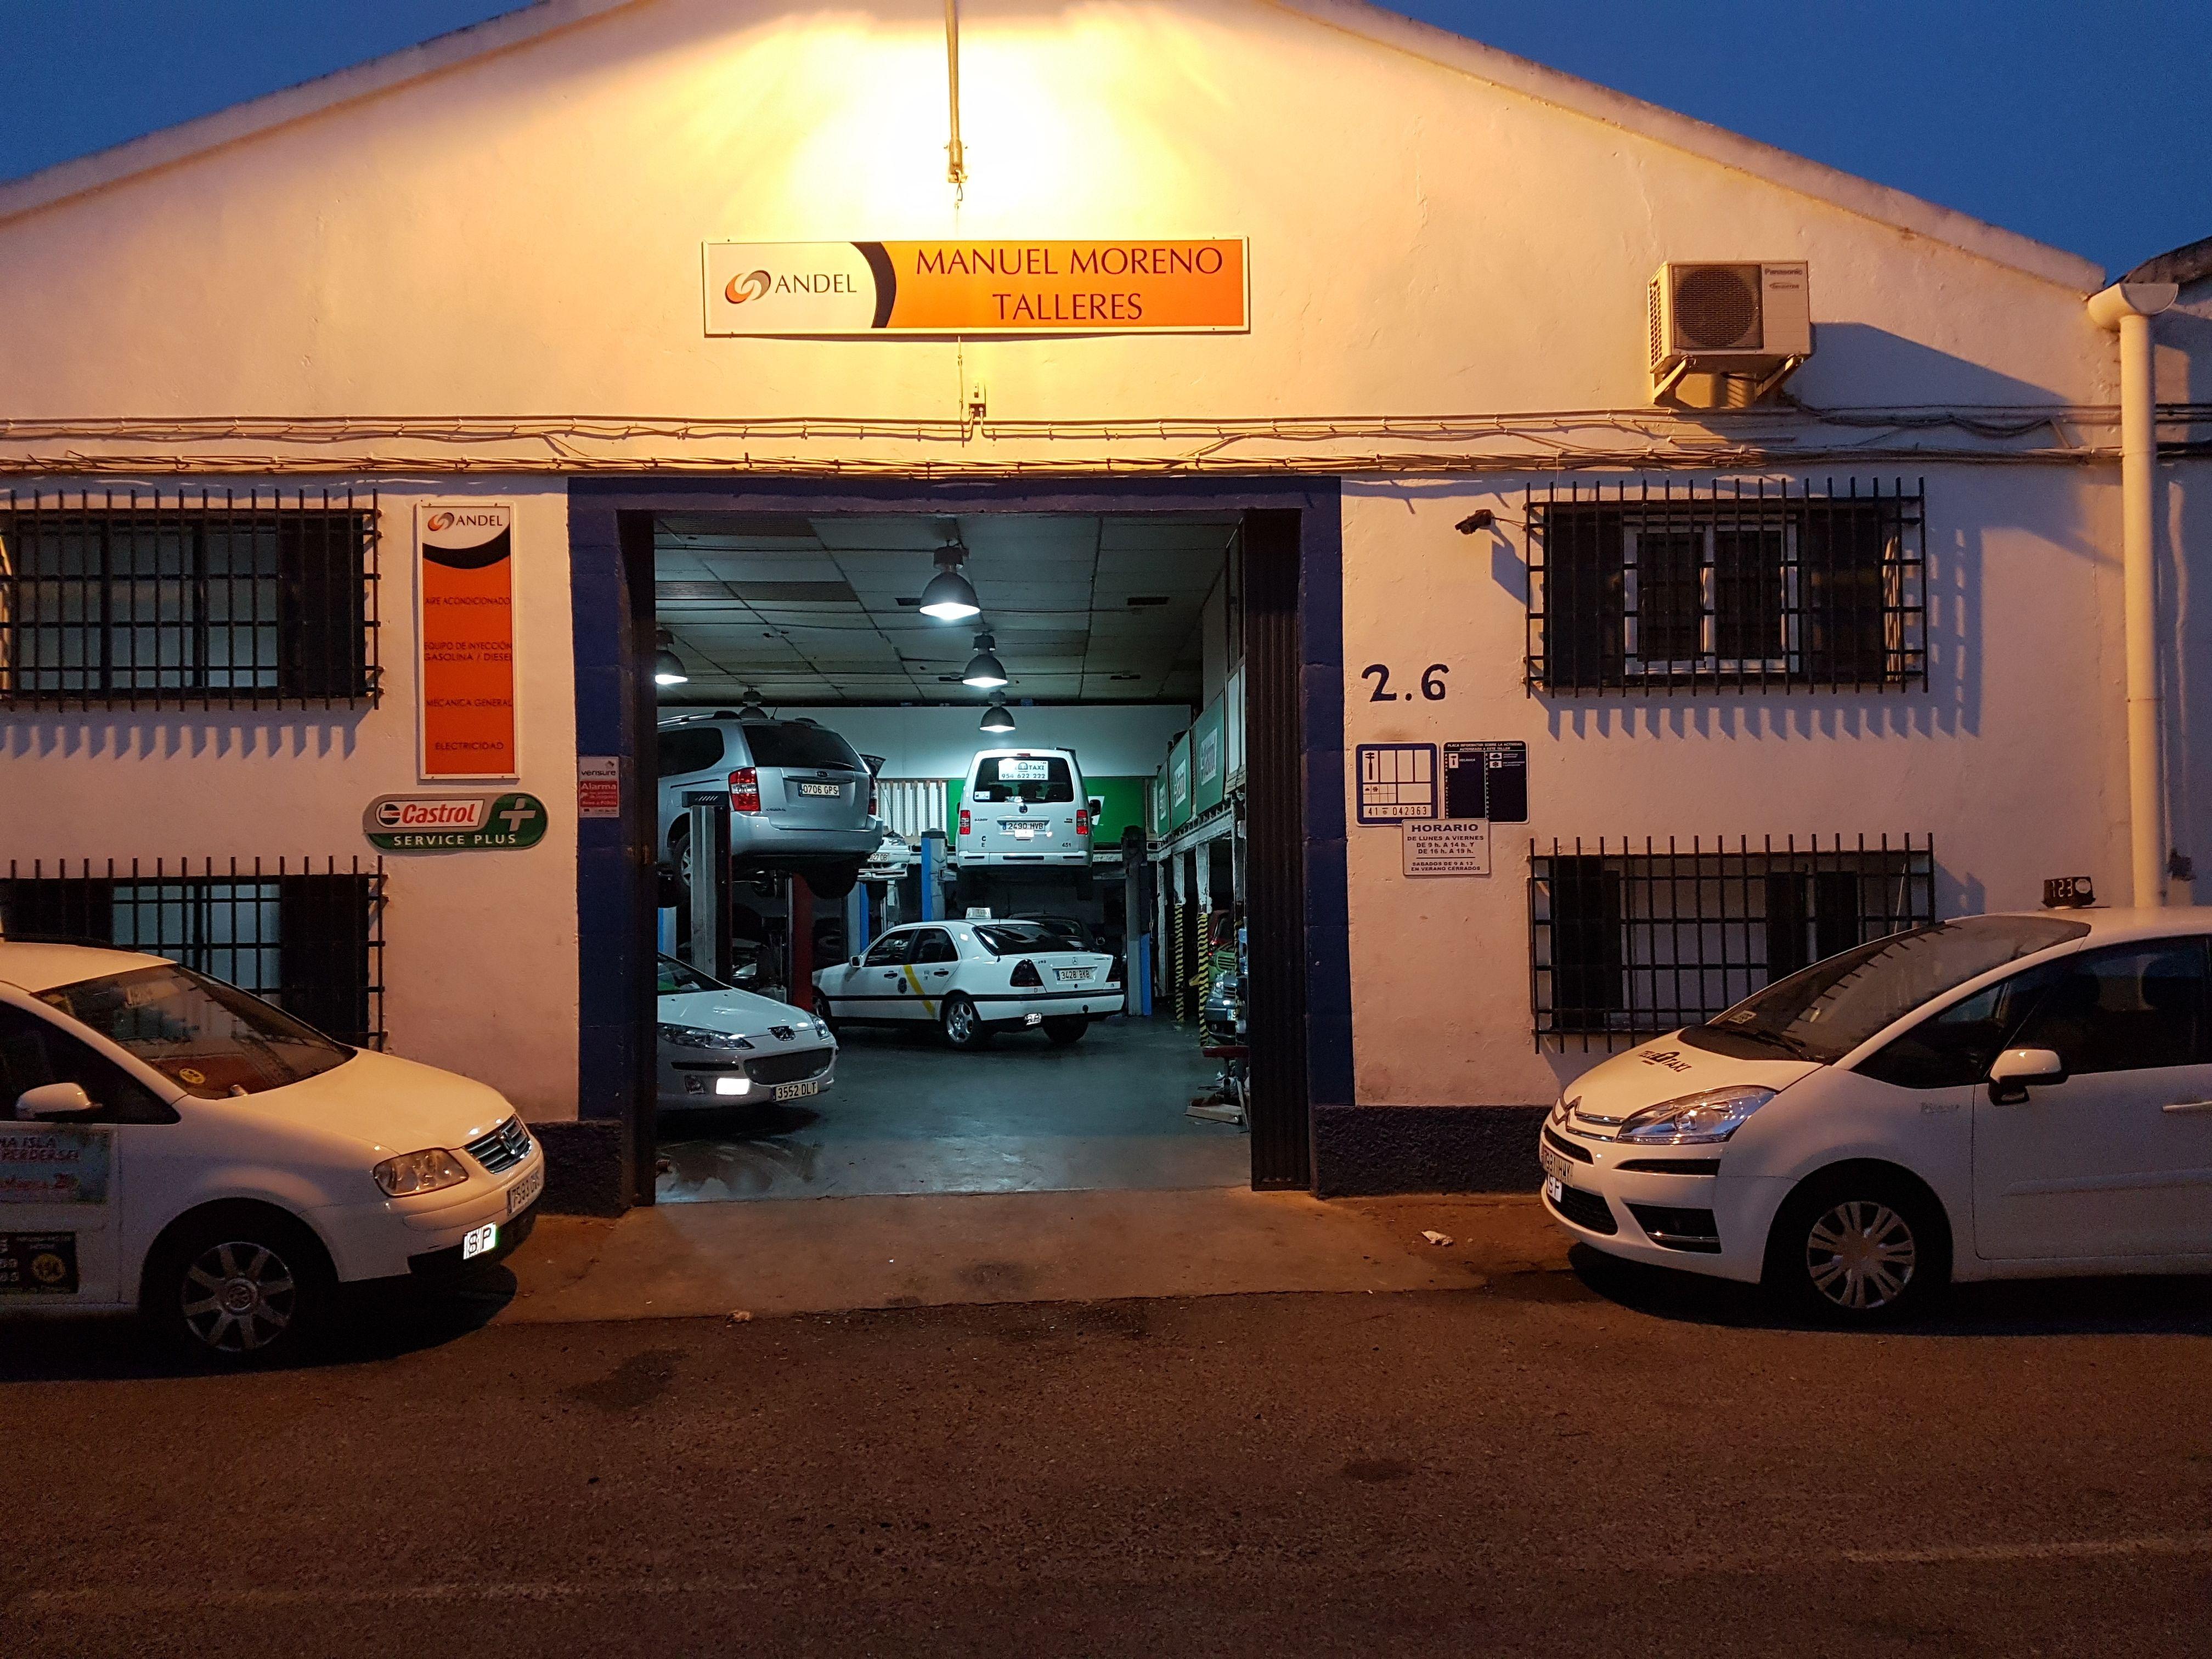 Montaje equipos GLP: Servicios de Taller Manuel Moreno